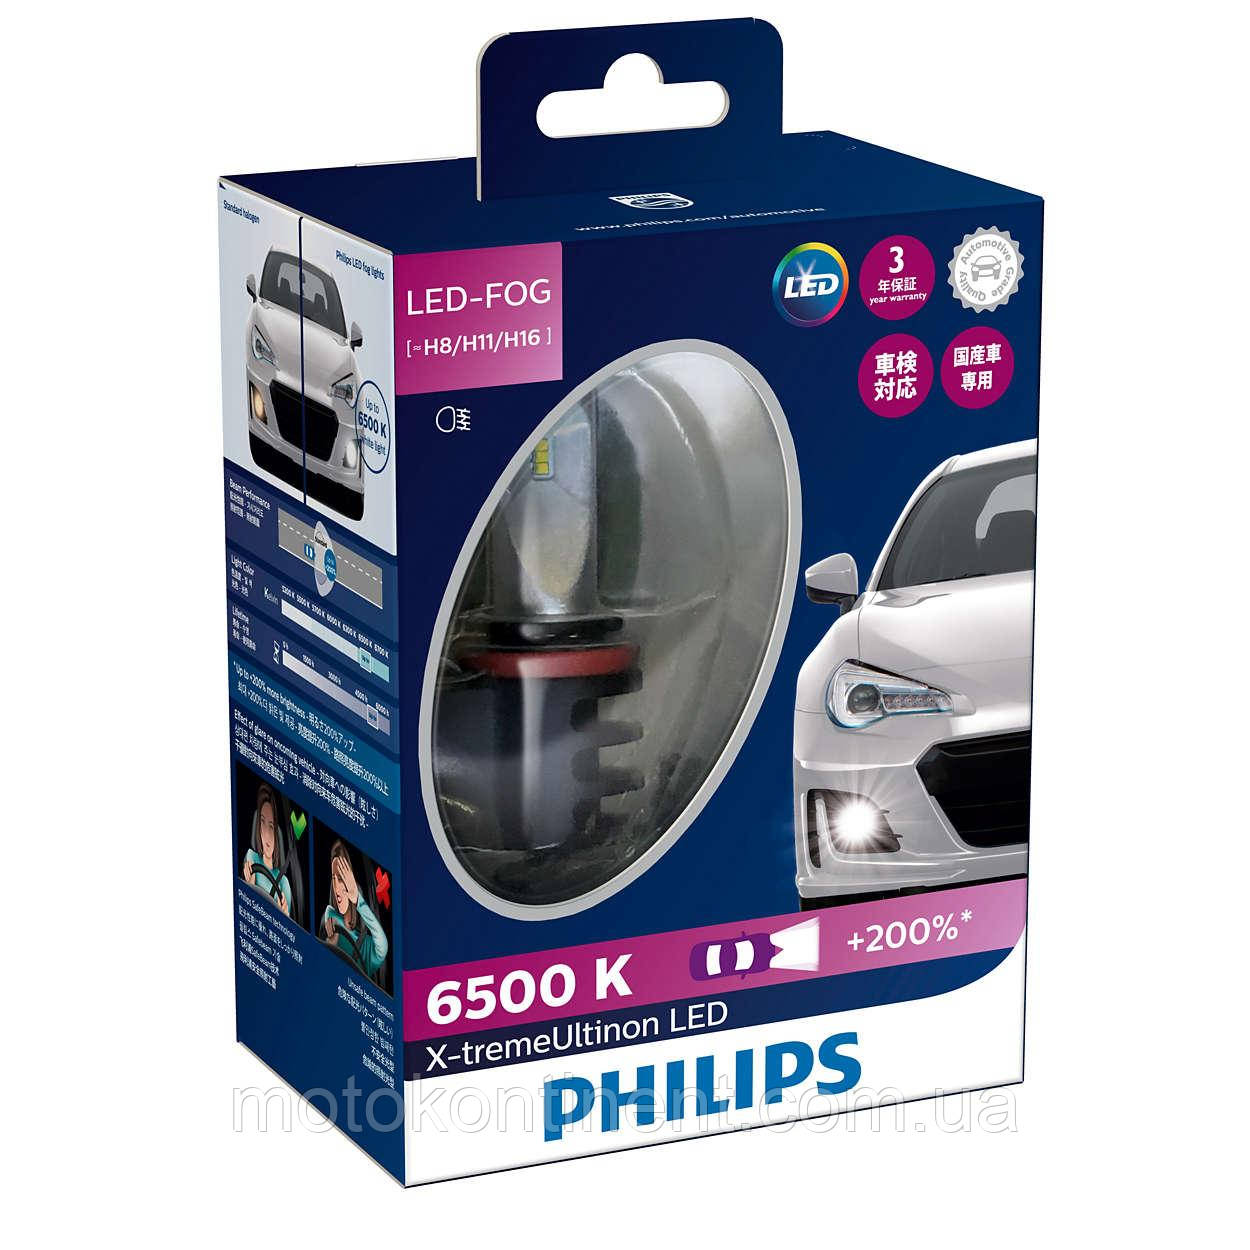 PHILIPS LED H8/H11/H16 Cветодиодные лампы PHILIPS в ПТФ H8/H11/H16 X-treme Ultinon LED Fog 6500K 12794UNIX2